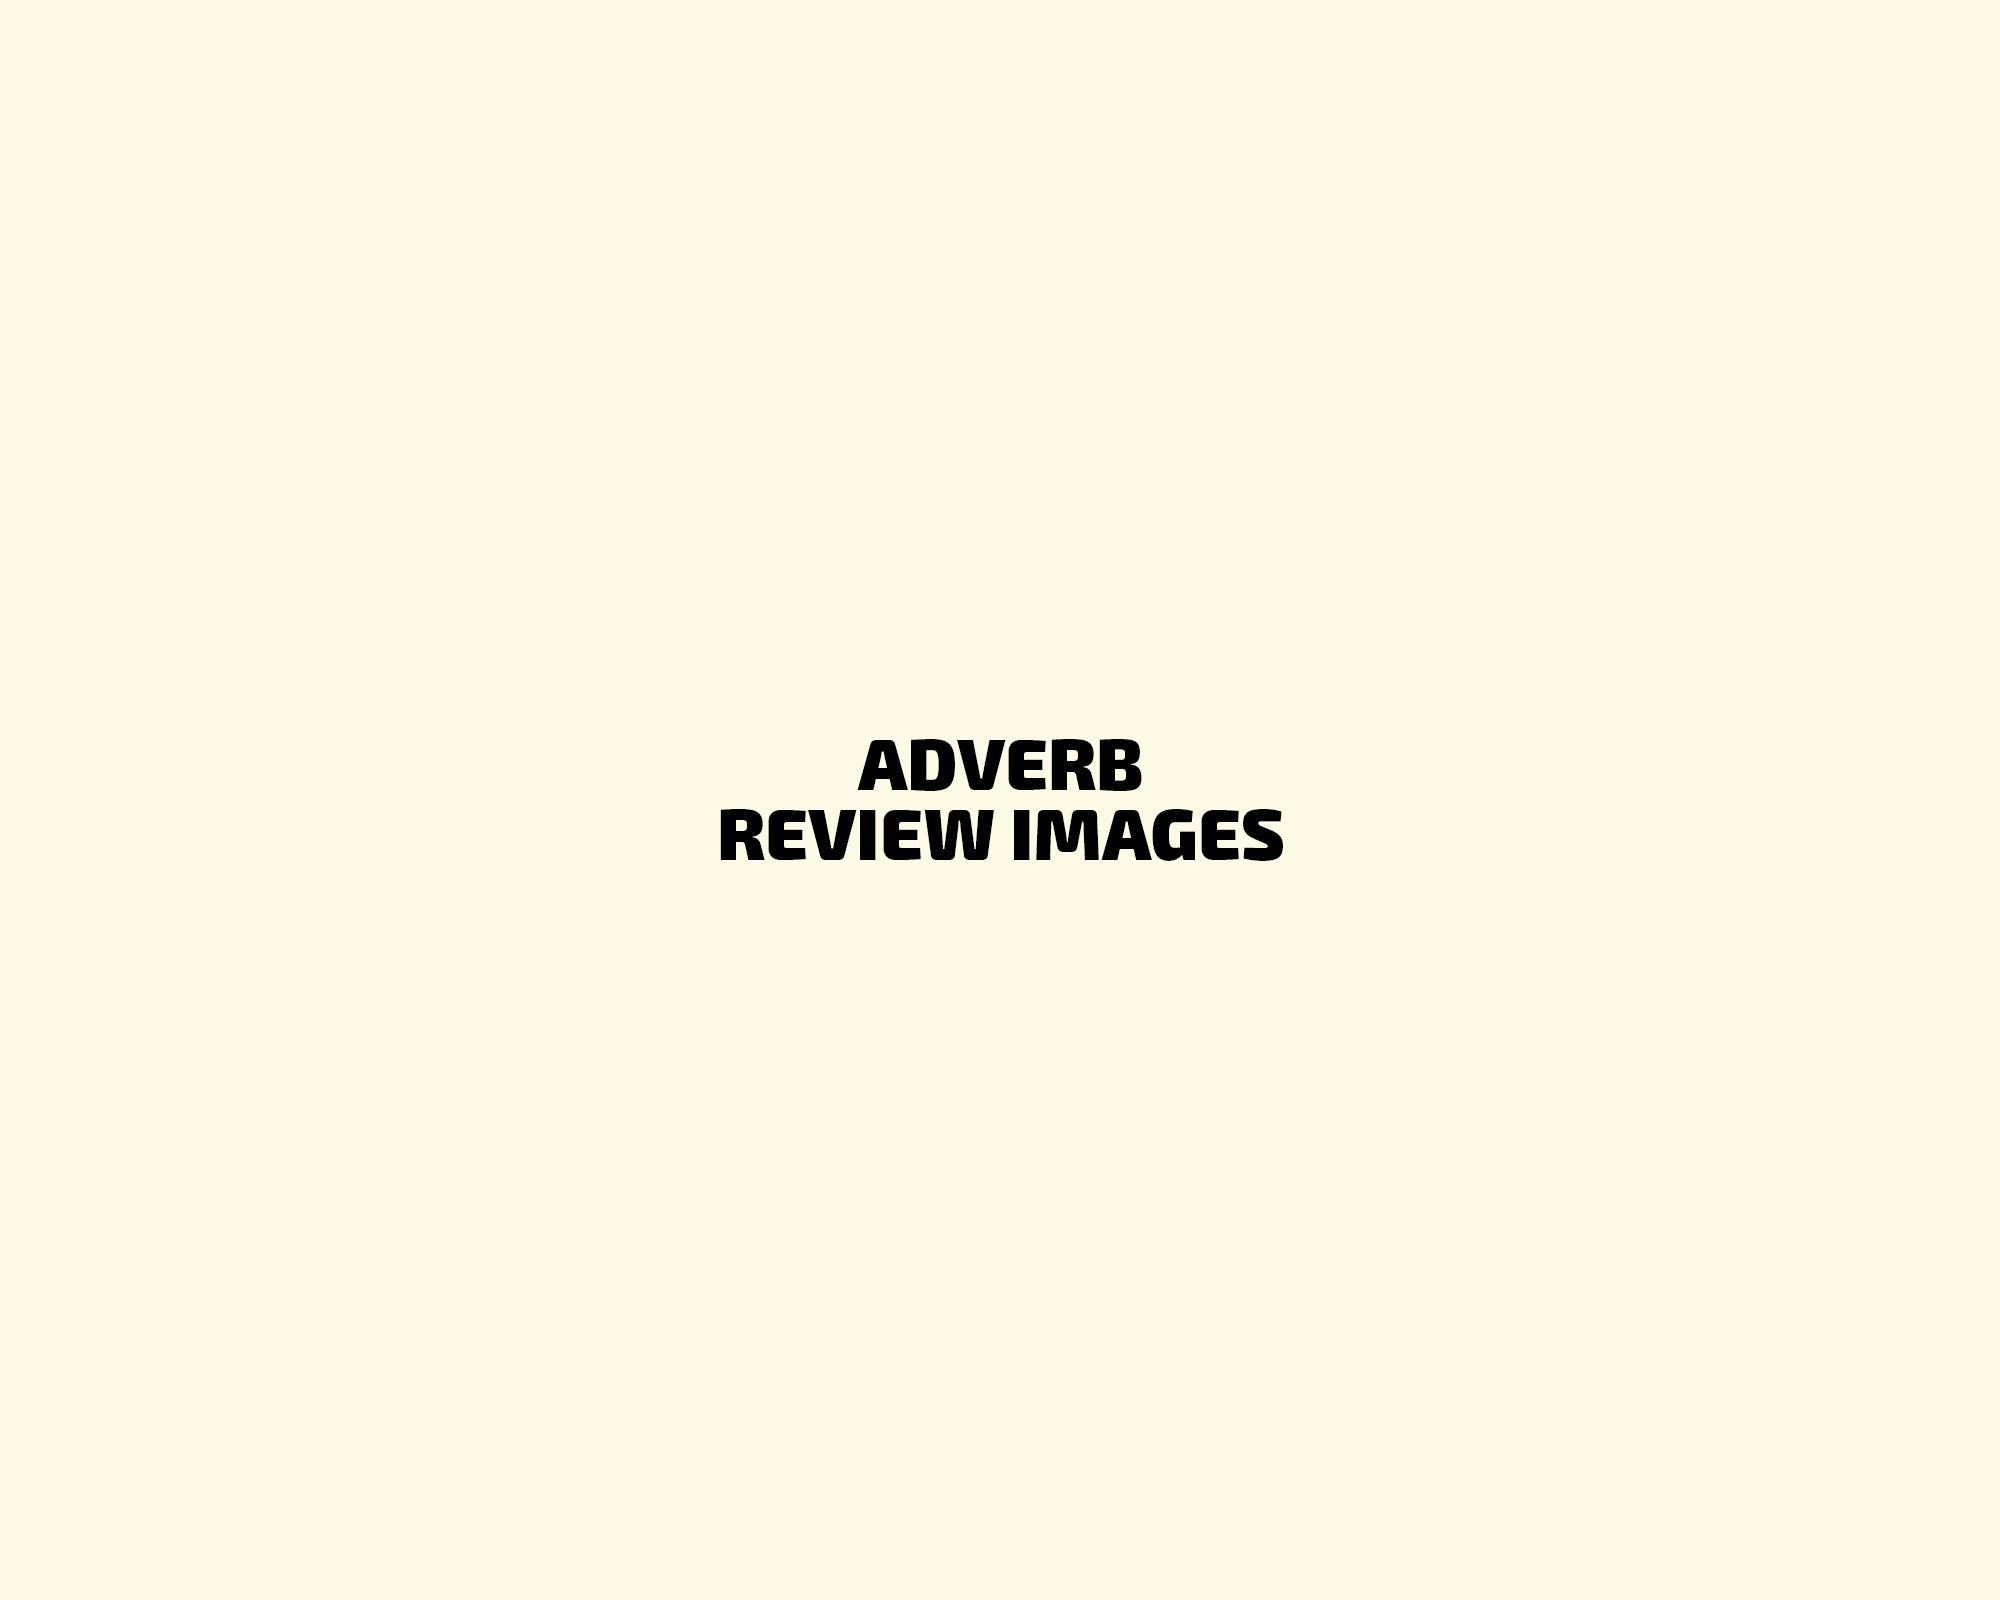 c-adverbs-gallery